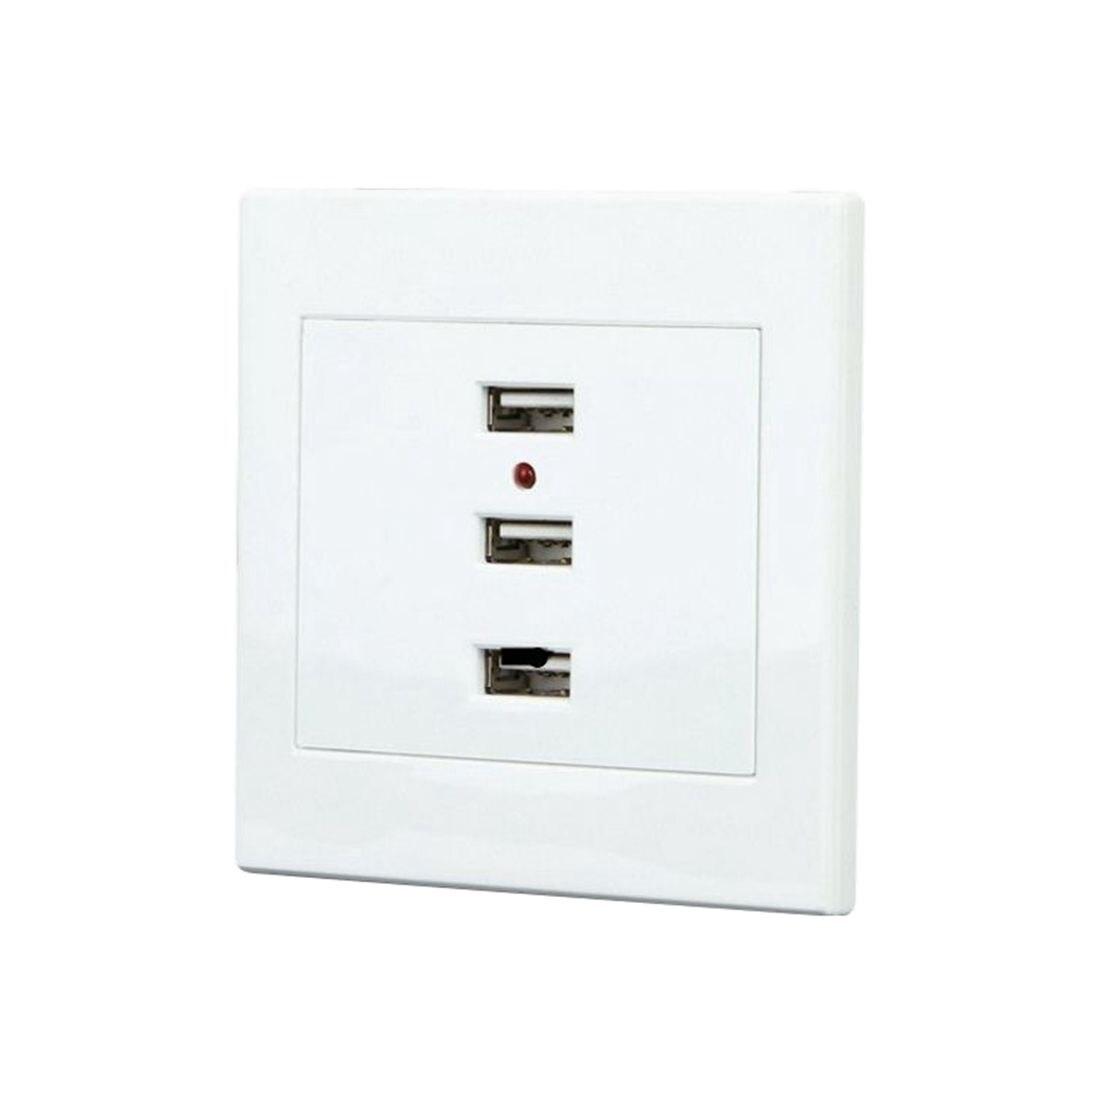 FUNN-3 Ports <font><b>USB</b></font> 2.0 <font><b>Wall</b></font> Plug DC 5V 10A <font><b>Charger</b></font> <font><b>Outlet</b></font> Panel Power Adapter